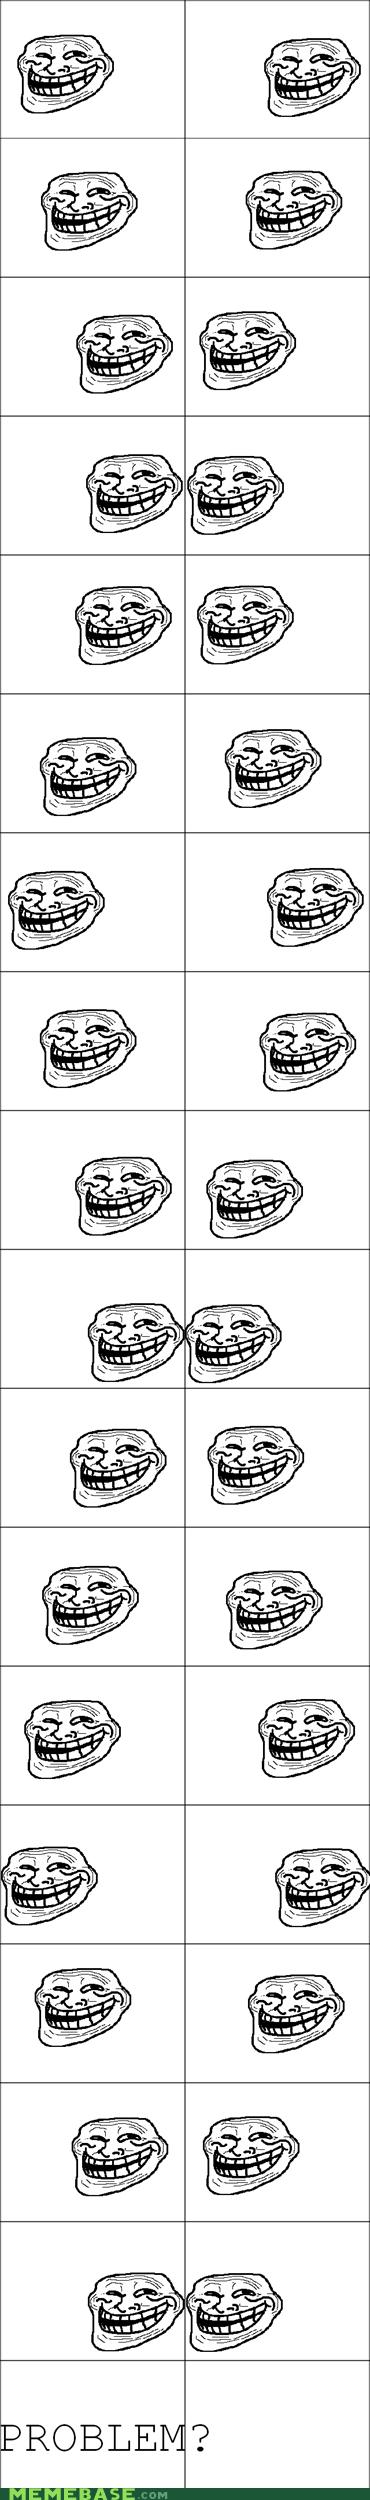 optical illusion problem Rage Comics troll face - 6037218560